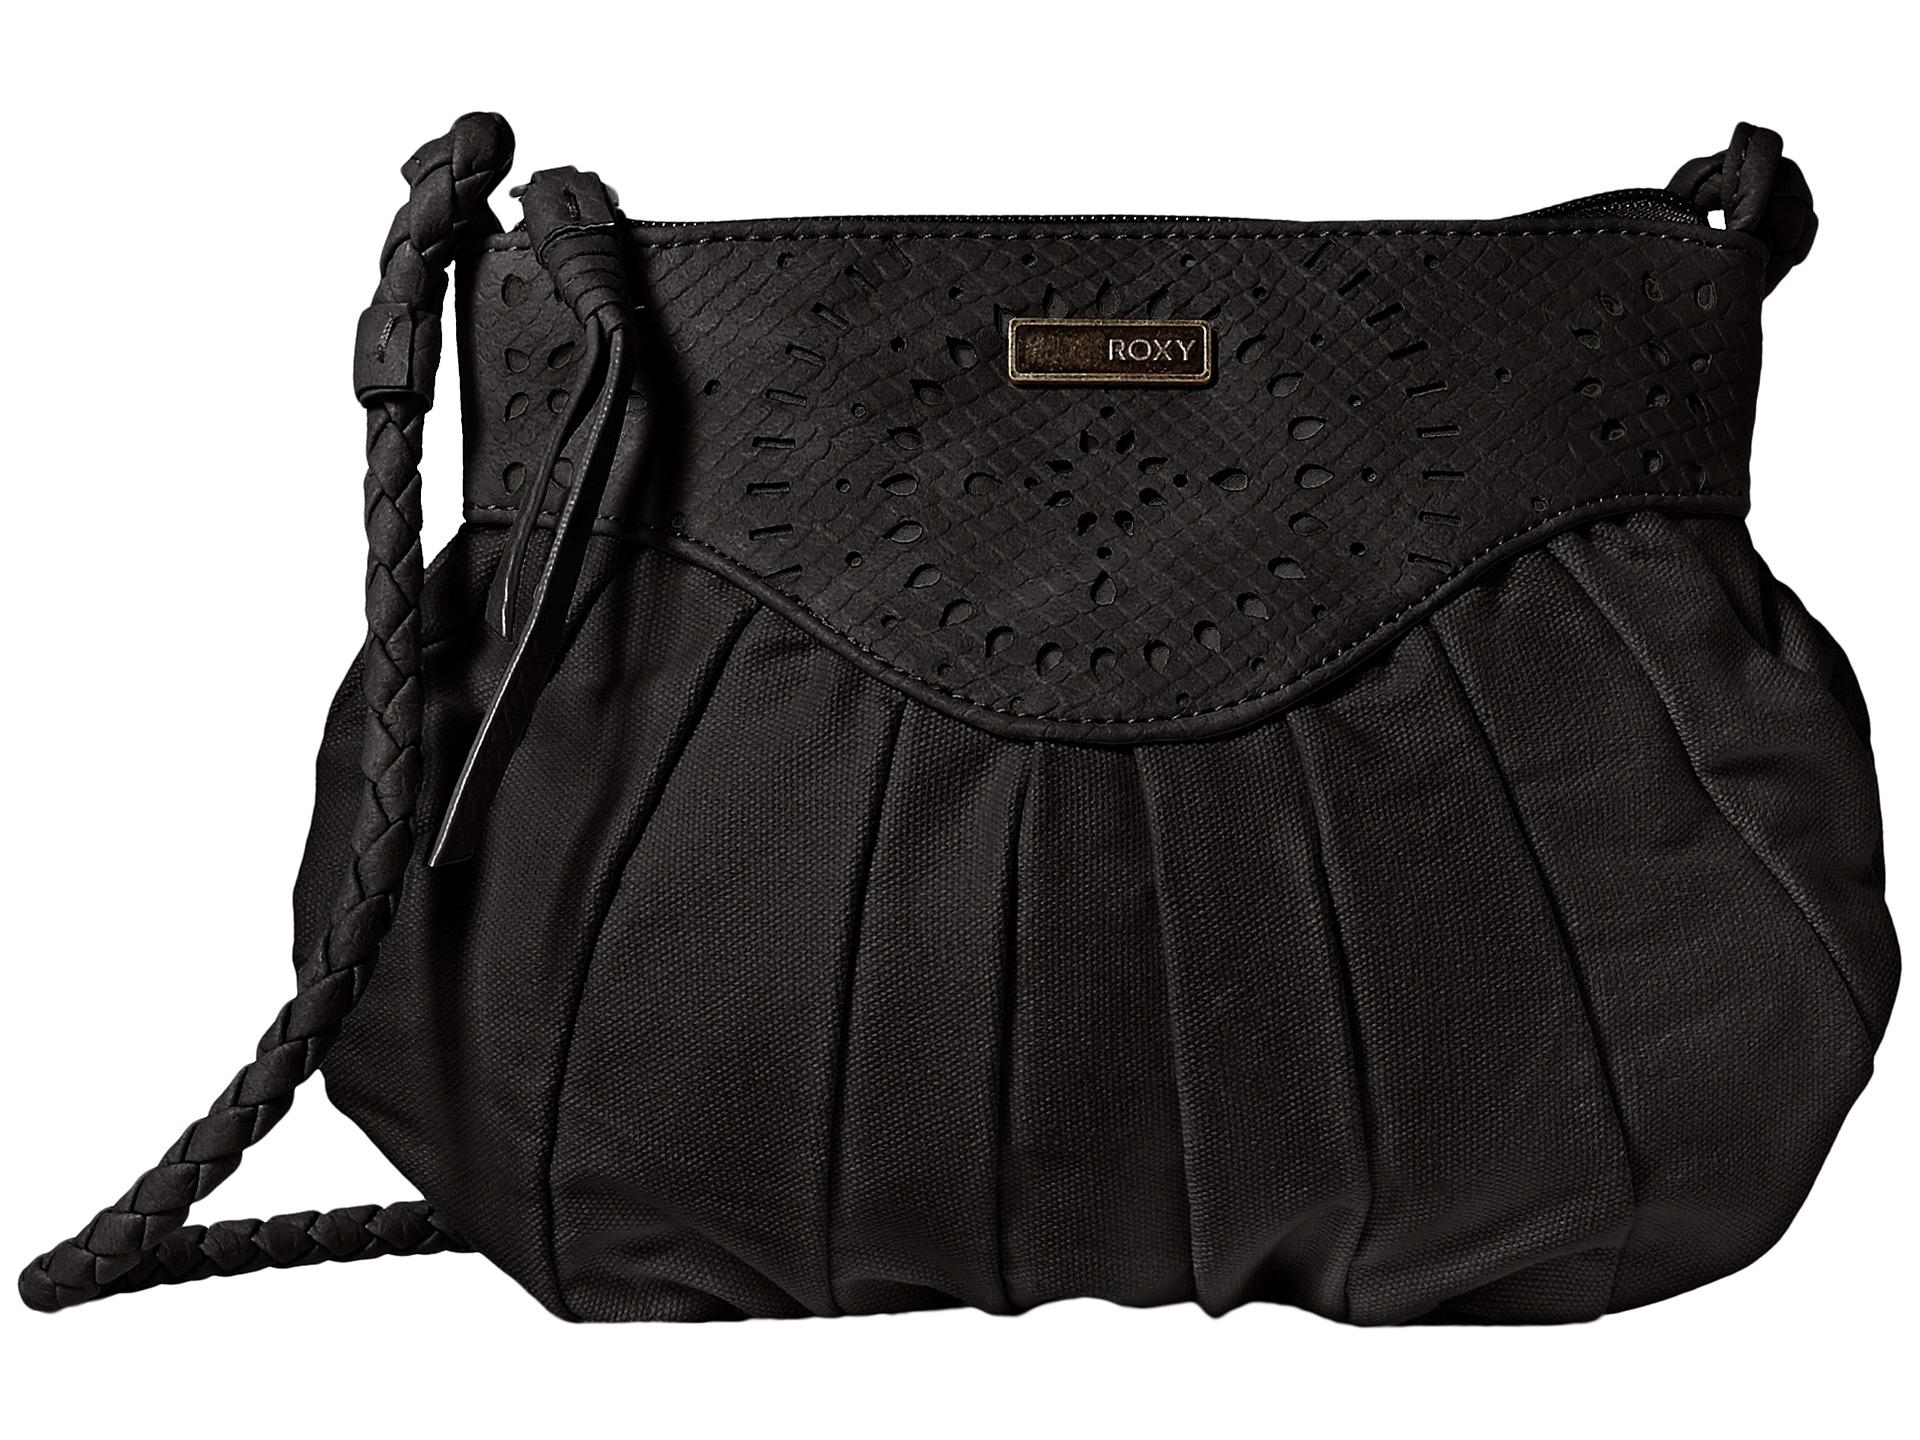 Roxy Eventide Crossbody Bag In Black Lyst